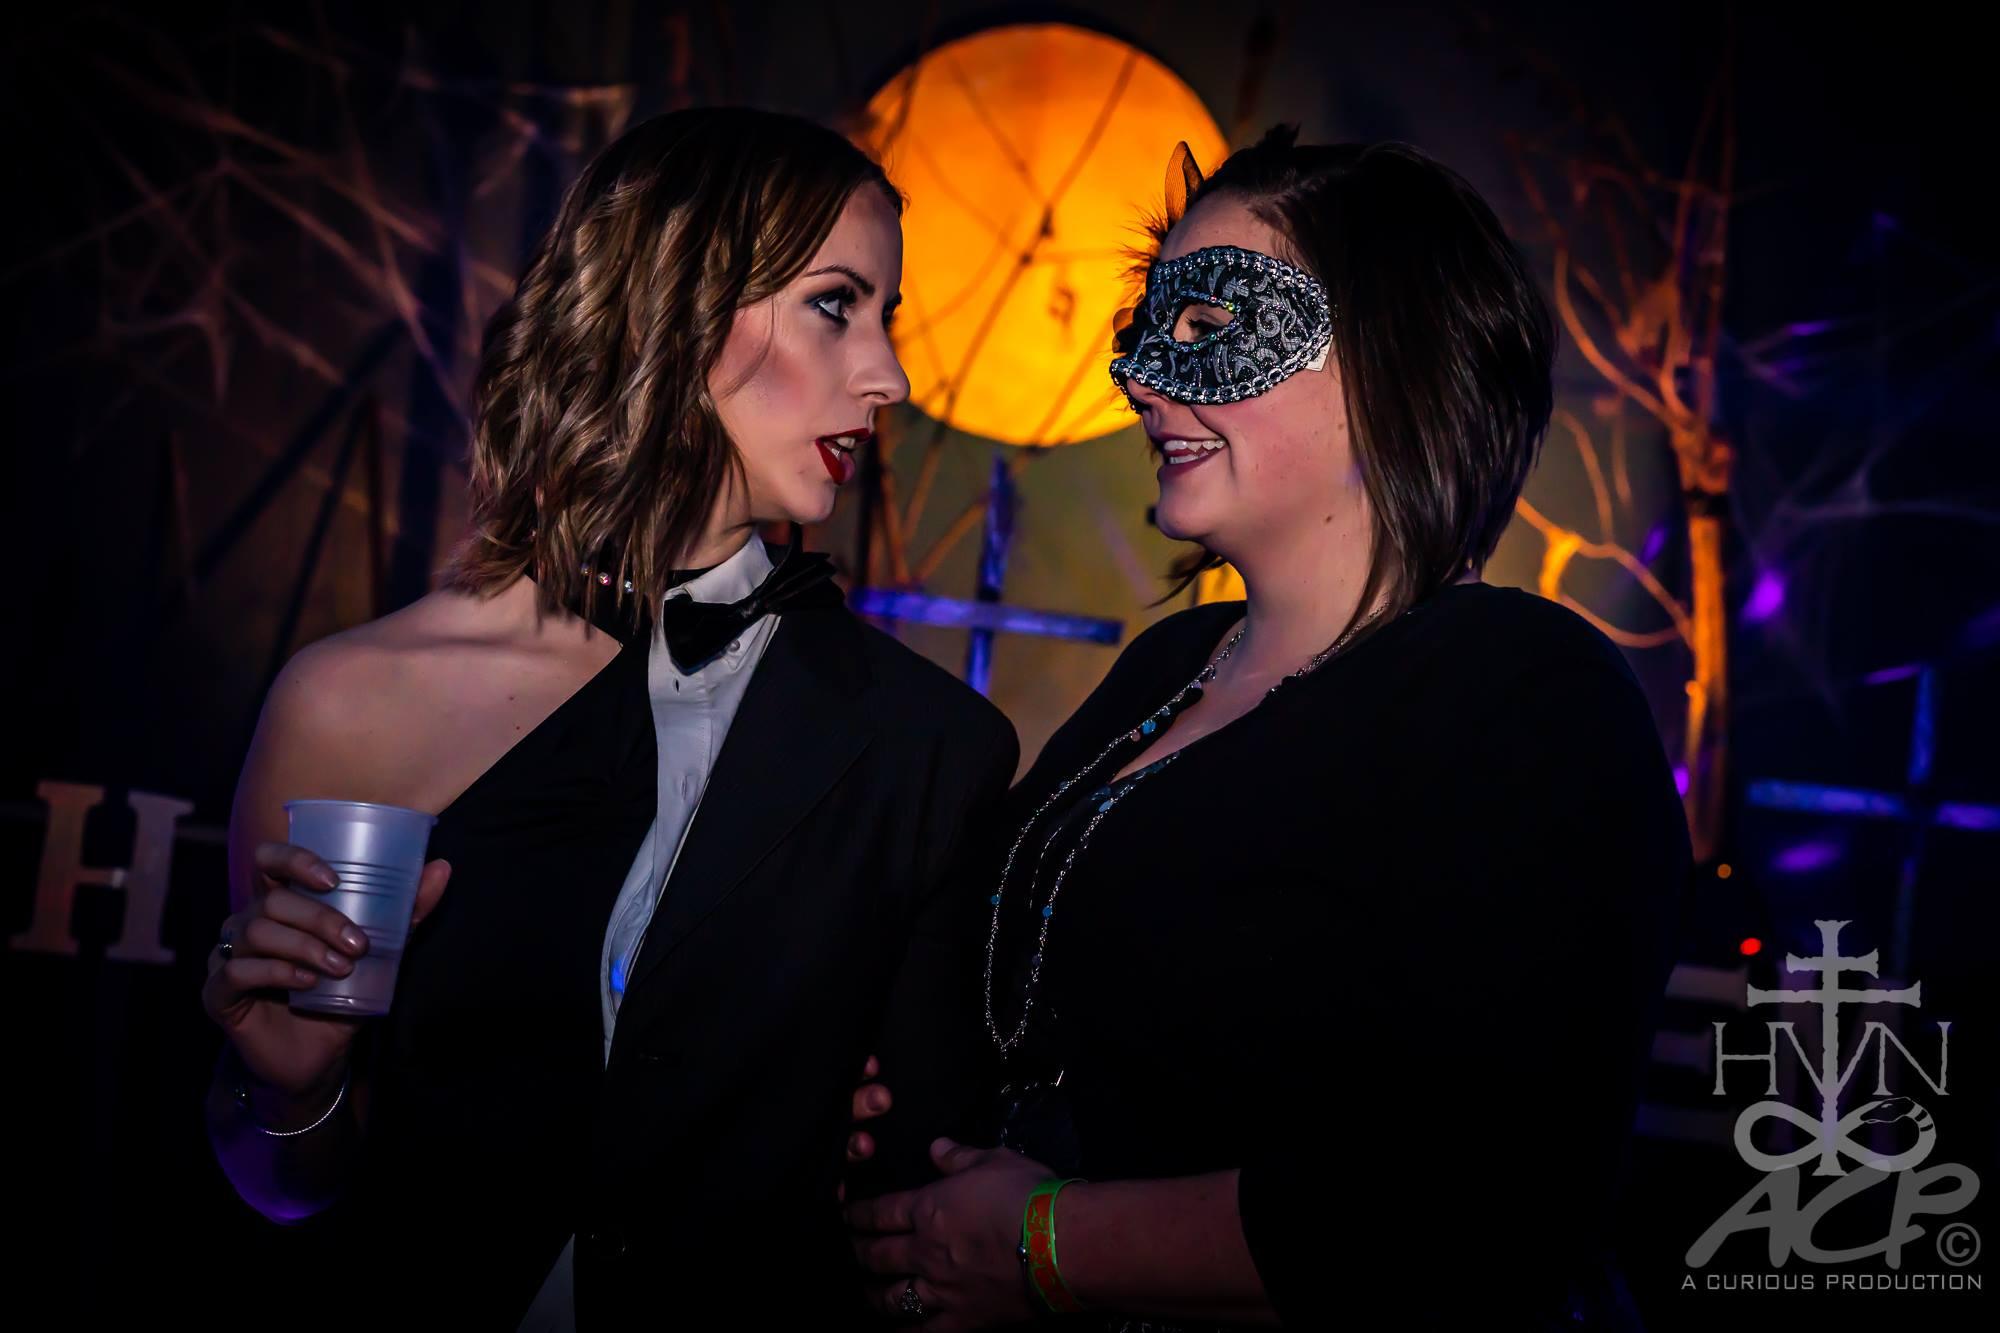 TheHavenClub-Goth-Industrial-Dance-Alternative-Northampton-MA -Halloween 2018 (113).jpg